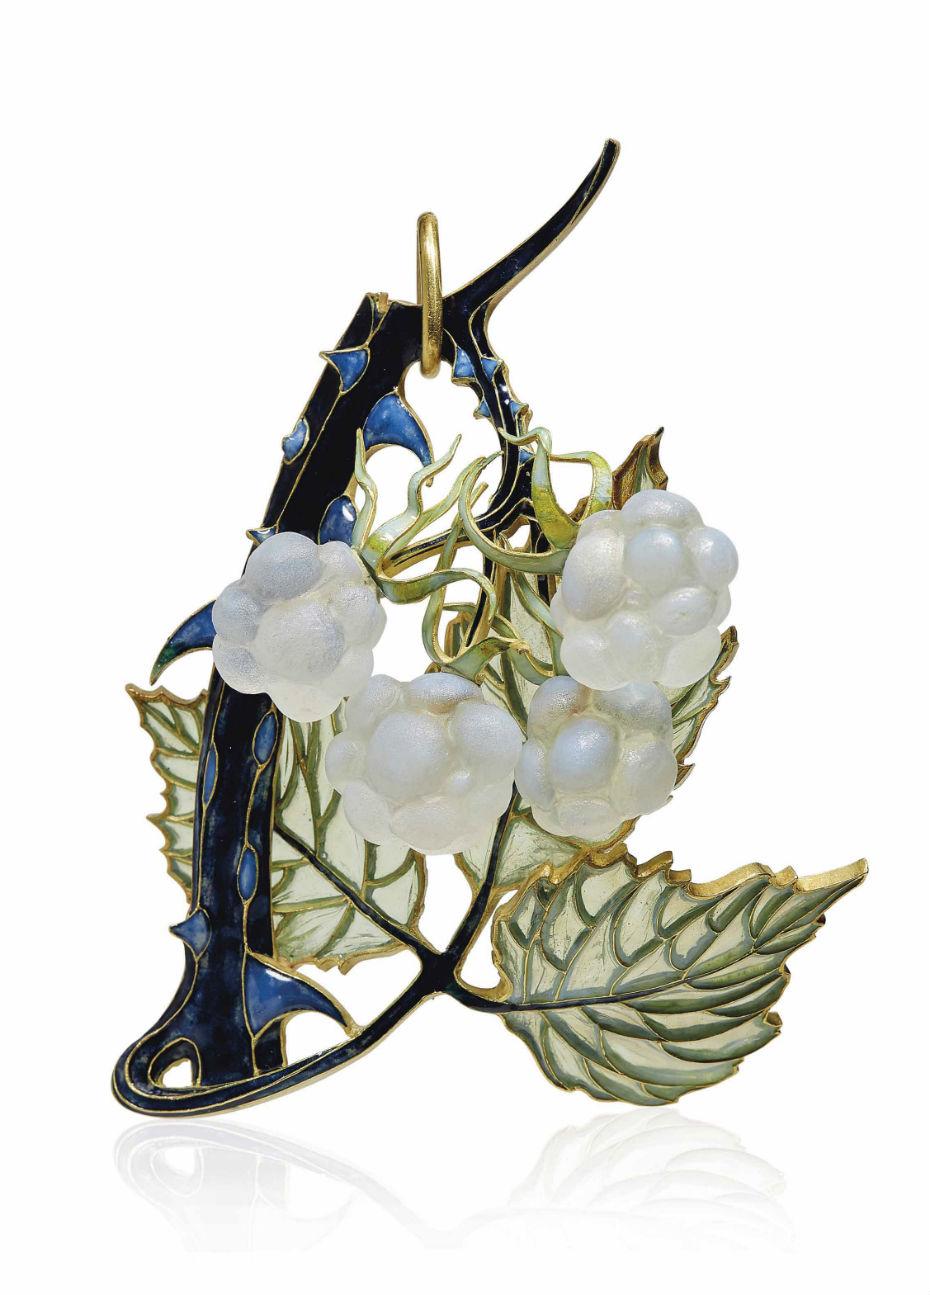 2017_GNV_15697_0026_000an_art_nouveau_enamel_and_glass_raspberry_pendant_by_rene_lalique.jpg